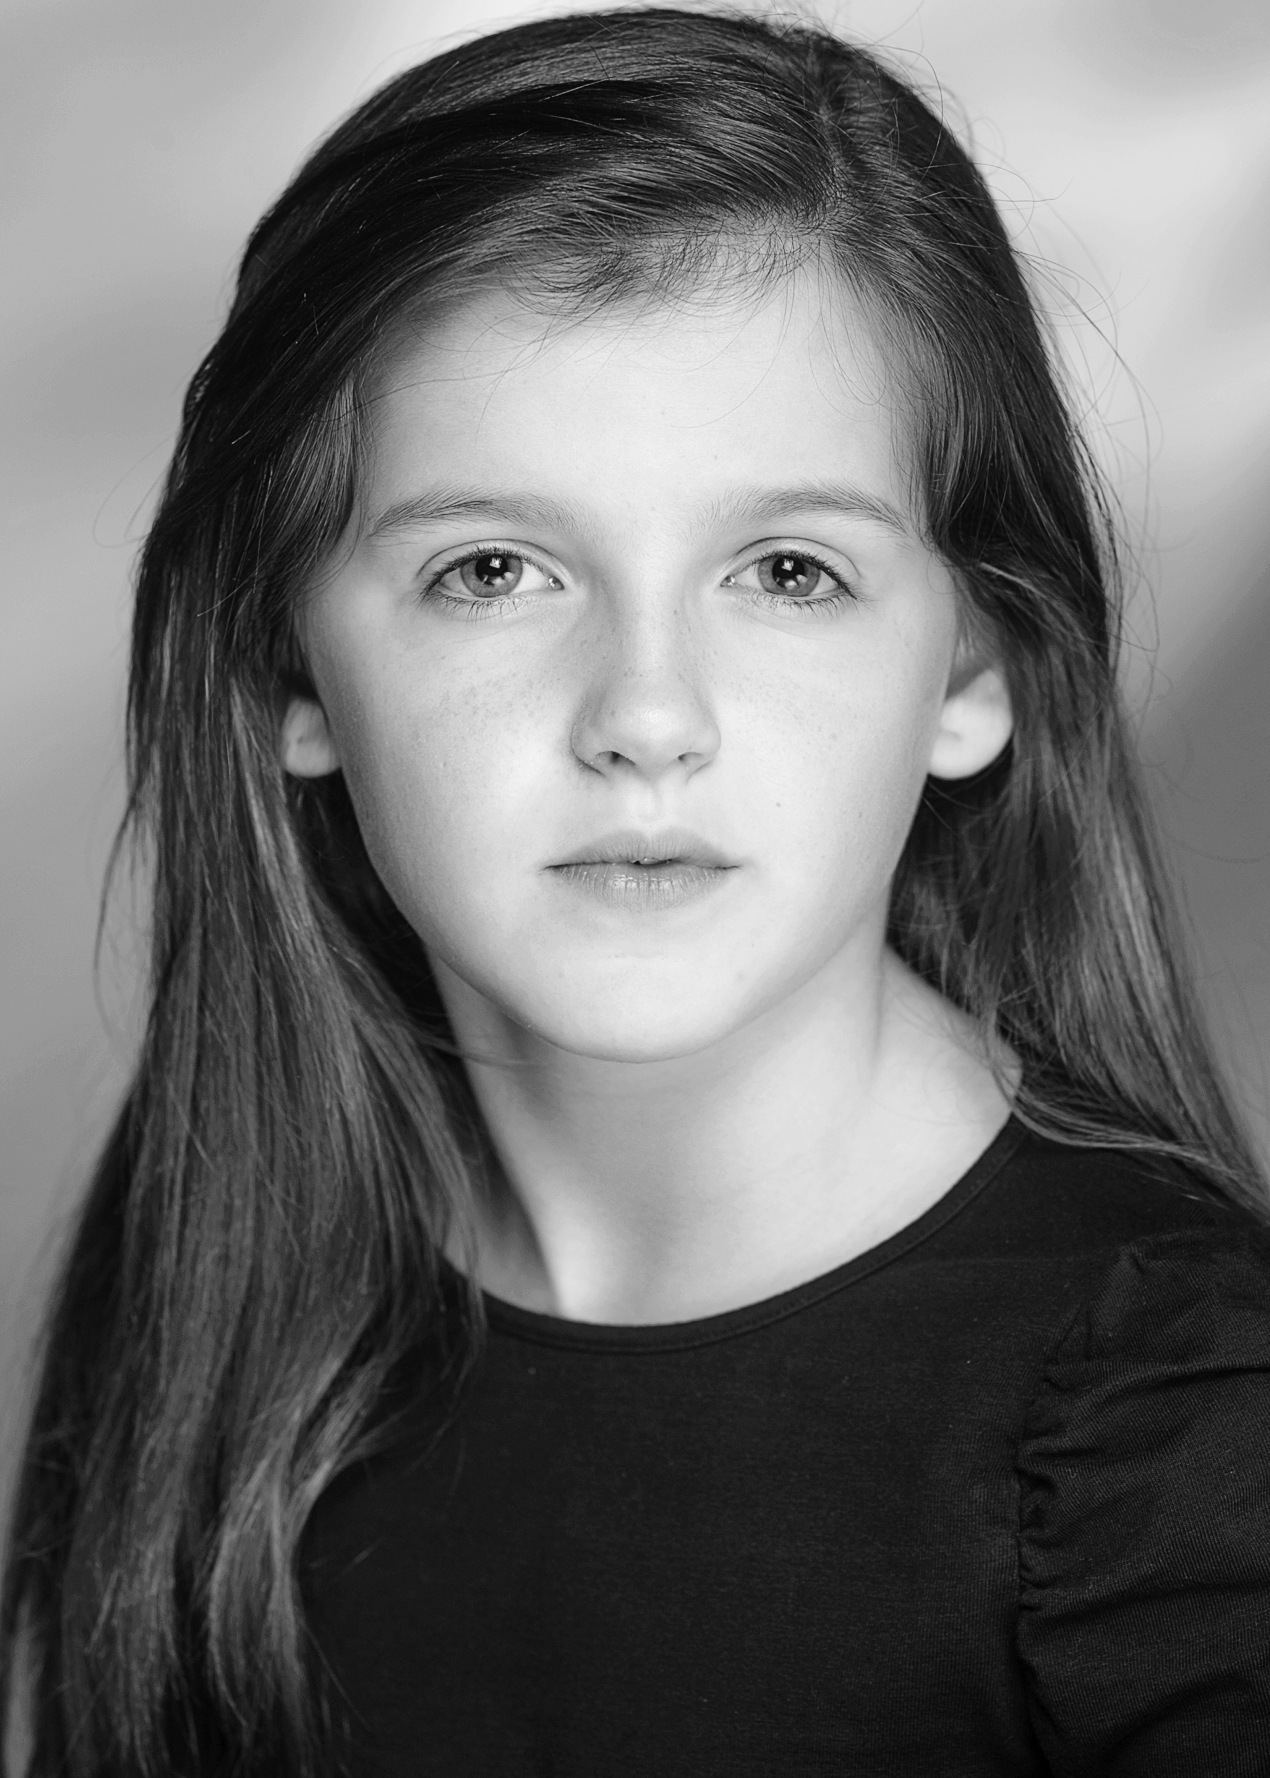 Ellie Gilbert